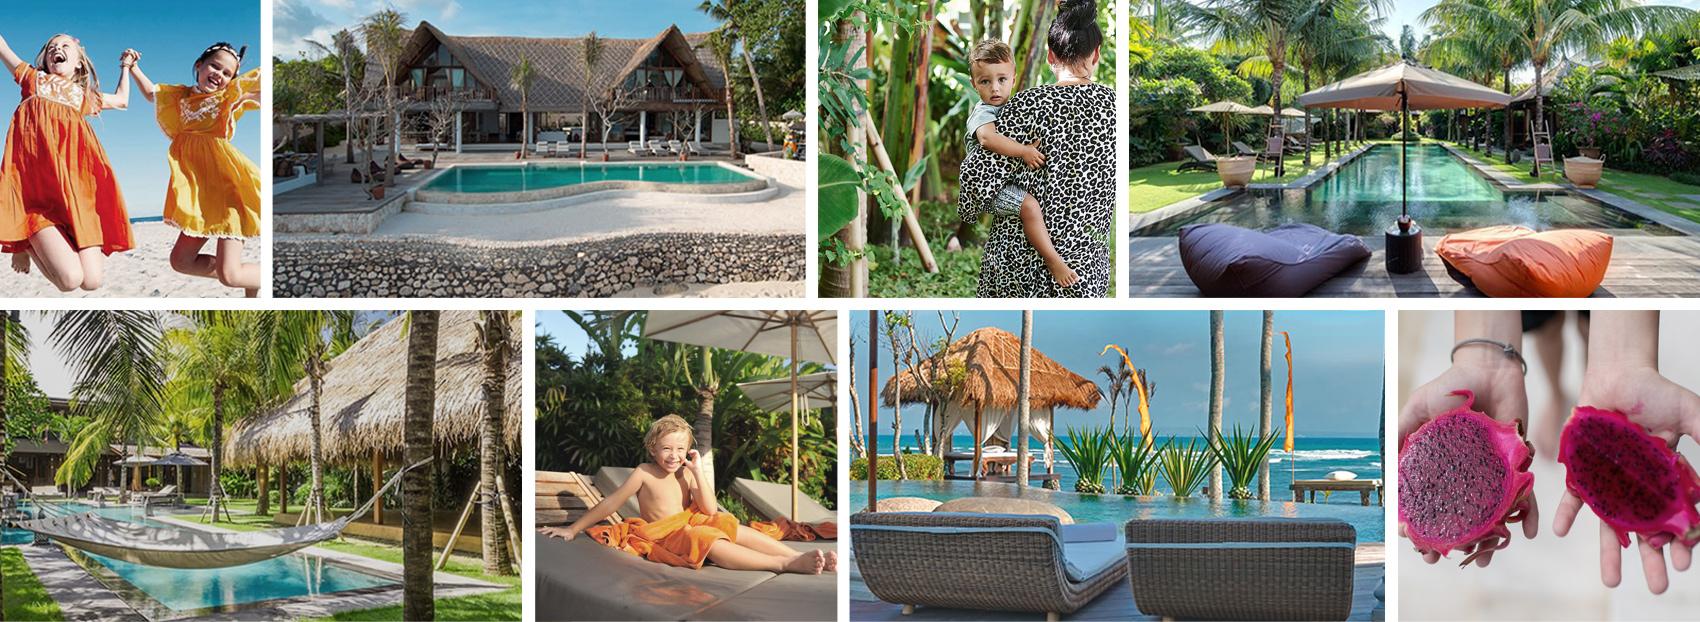 Bali Family Villas banner